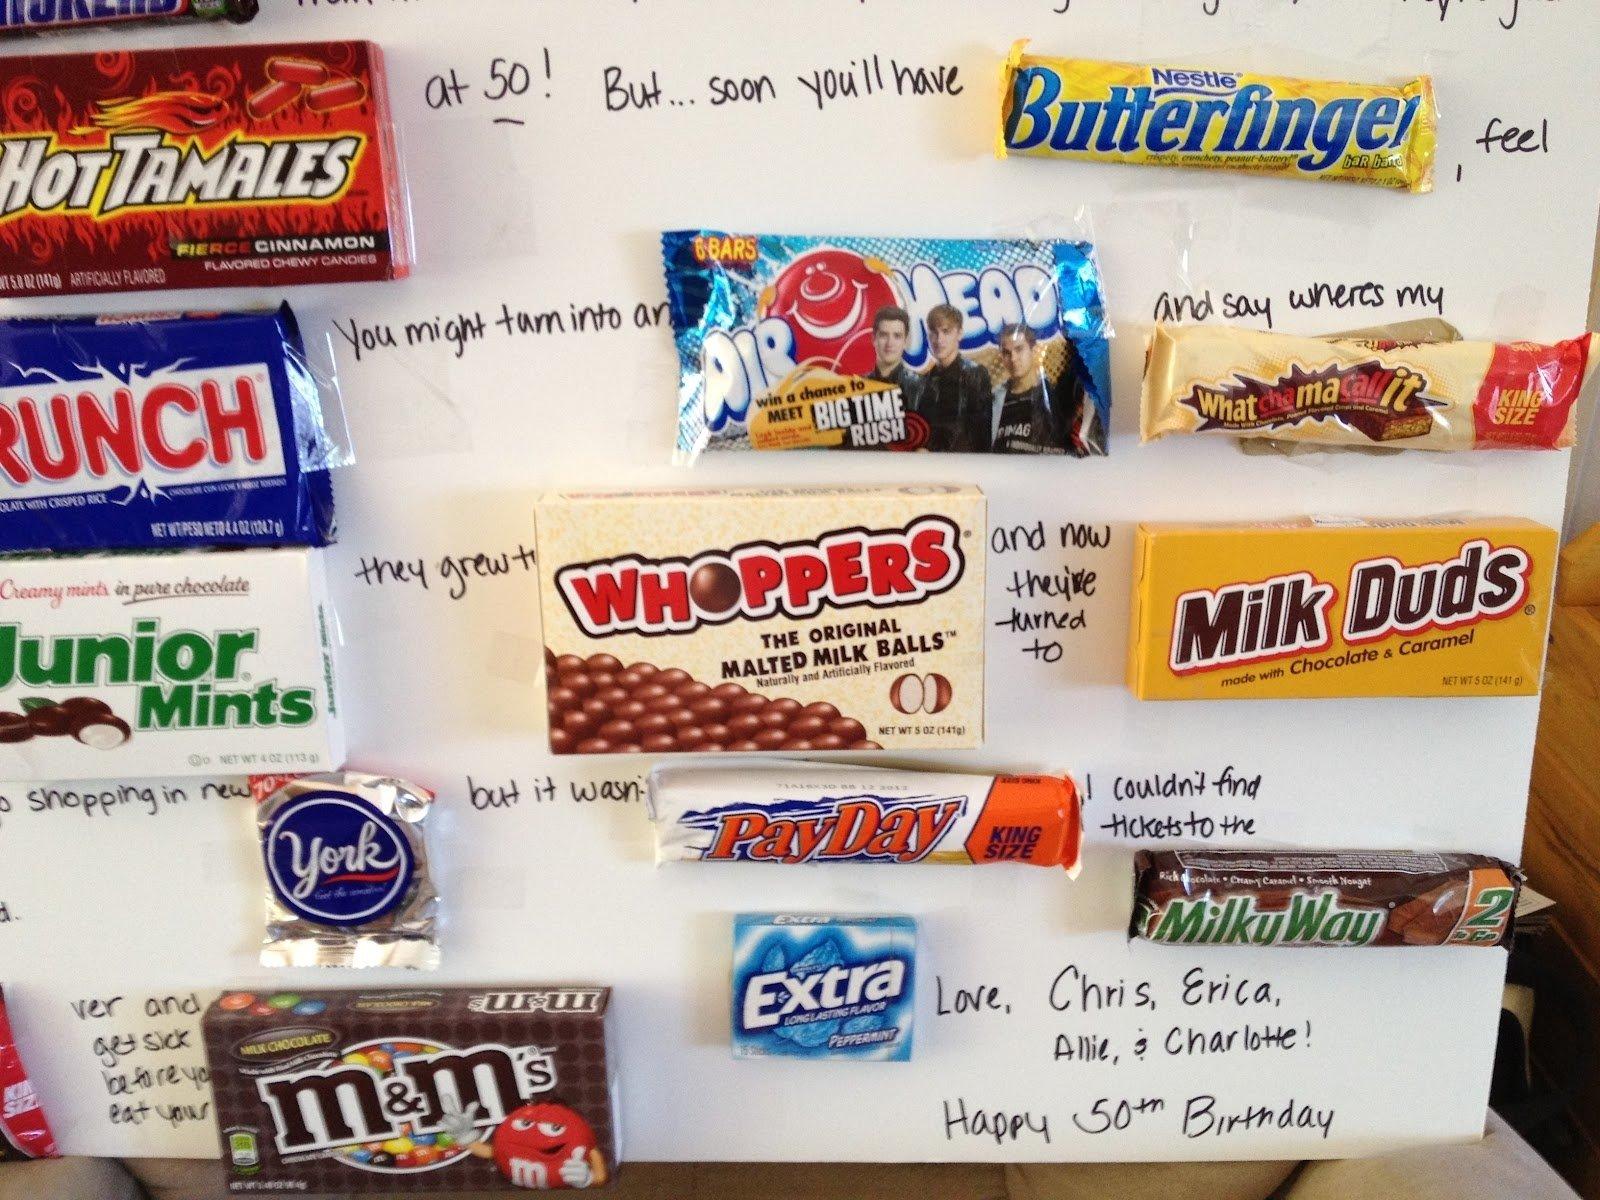 10 Trendy Ideas For 50Th Birthday Gift 40th birthday ideas 50th birthday present ideas for your mom 5 2020